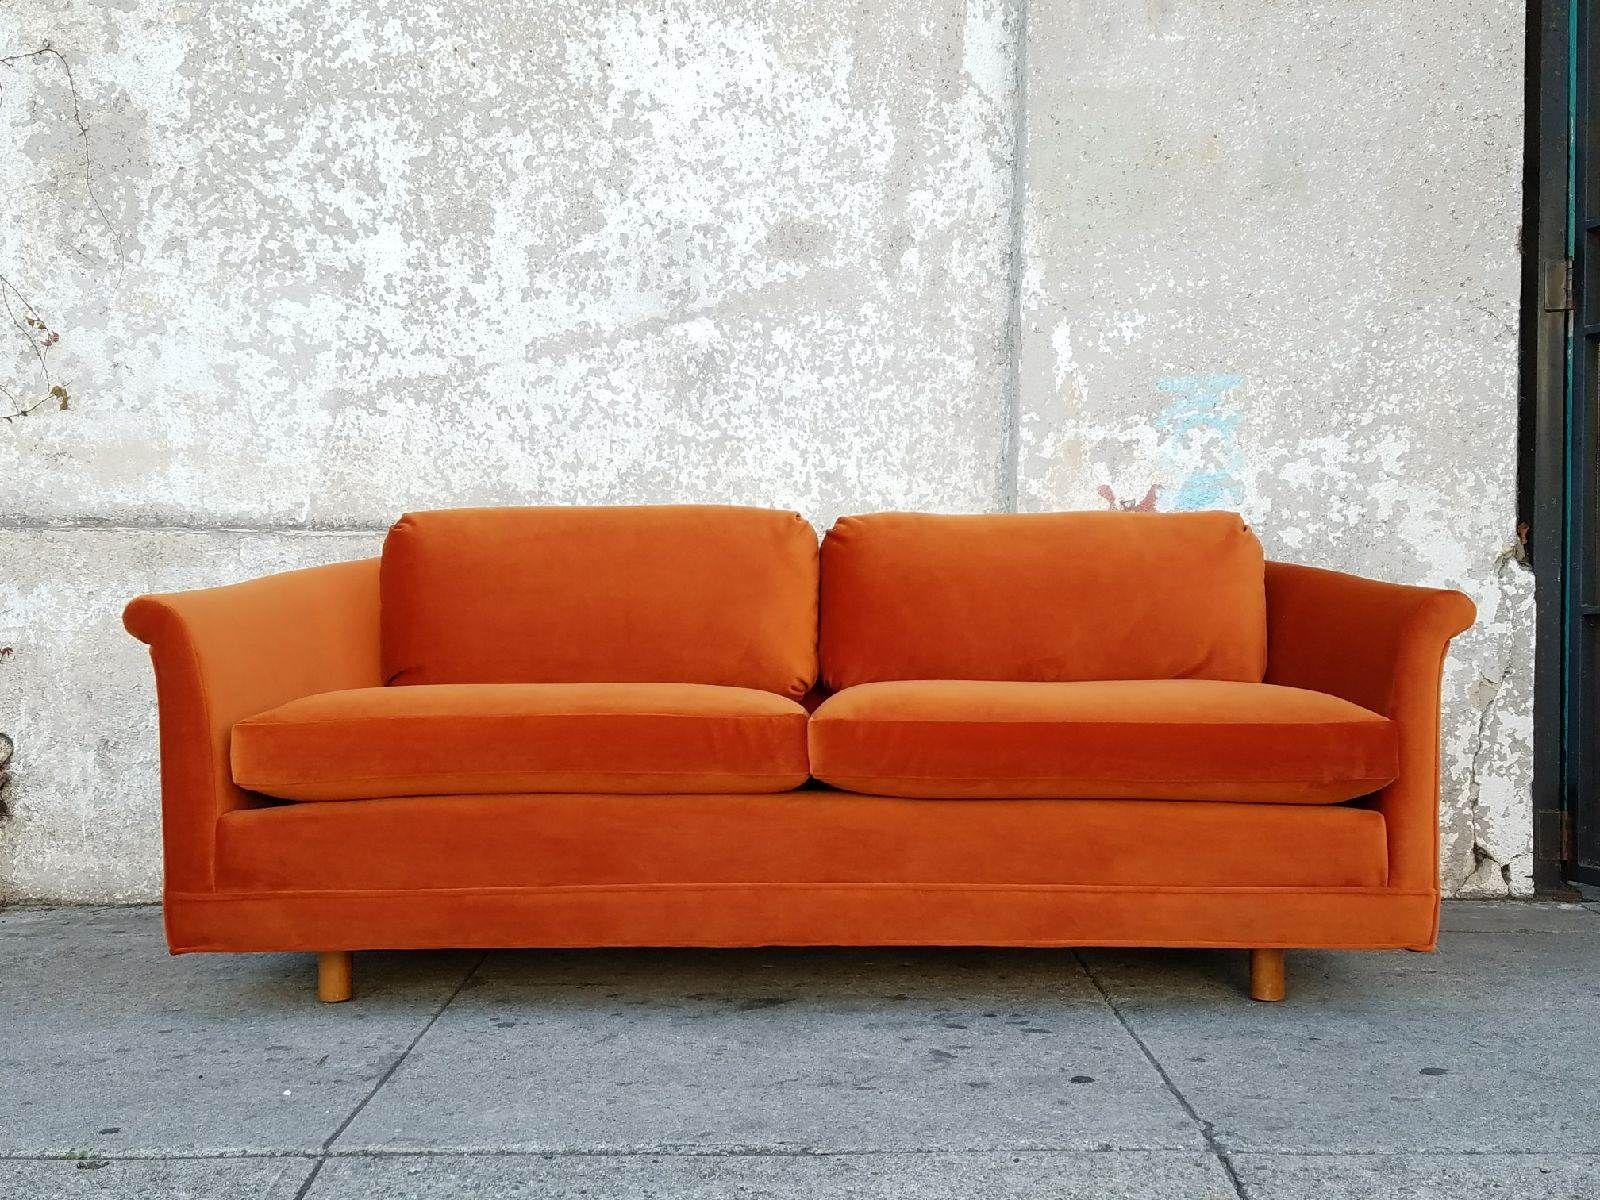 Orange Corral Deep Velvet Vintage Sofa Reupholstered 71 L X 33 W X